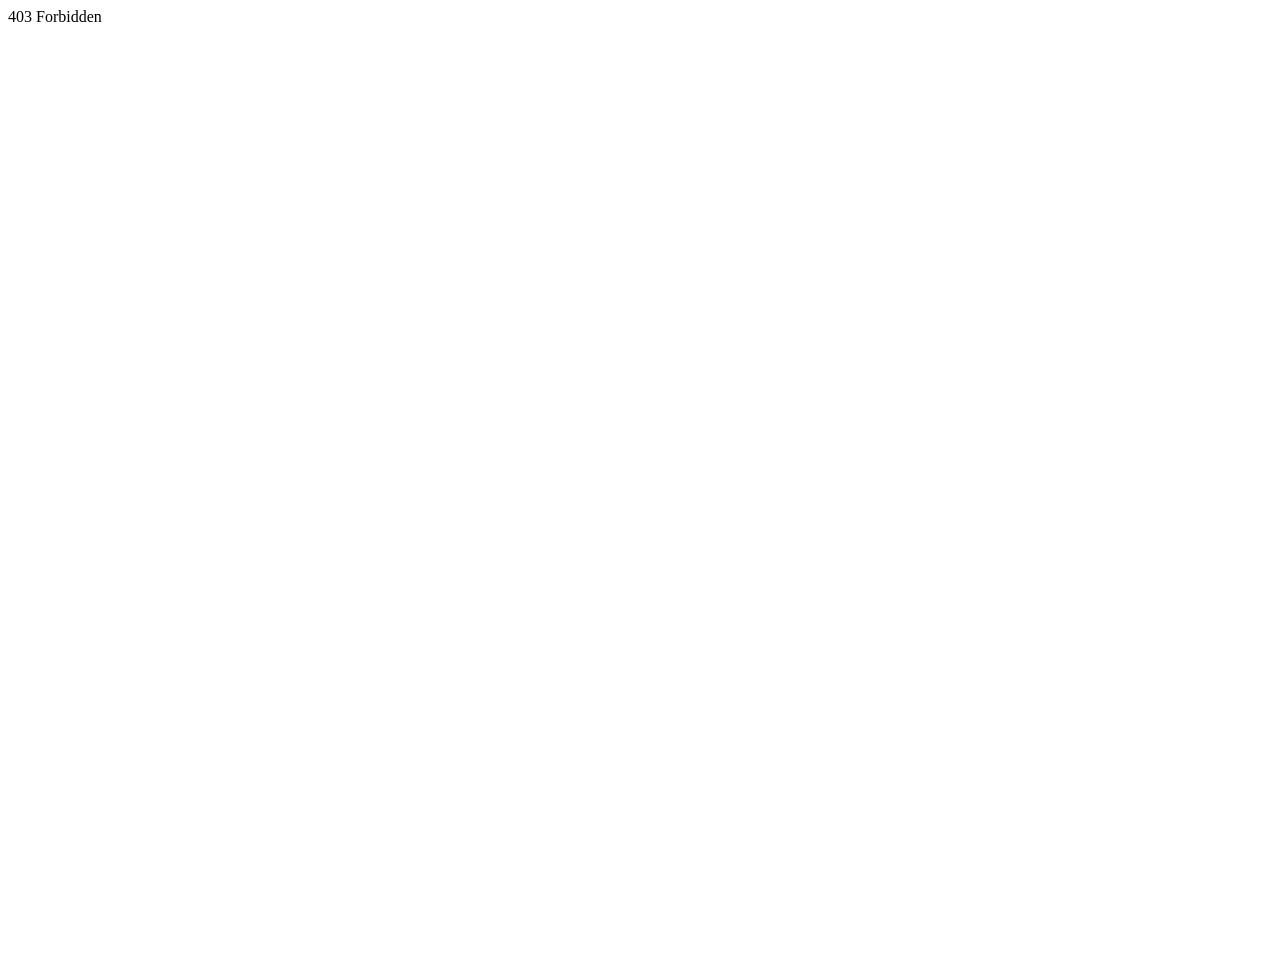 MLinkPlanner 1.2 Single User license unlimited + RadioPlanner 2.1 Single User license unlimited